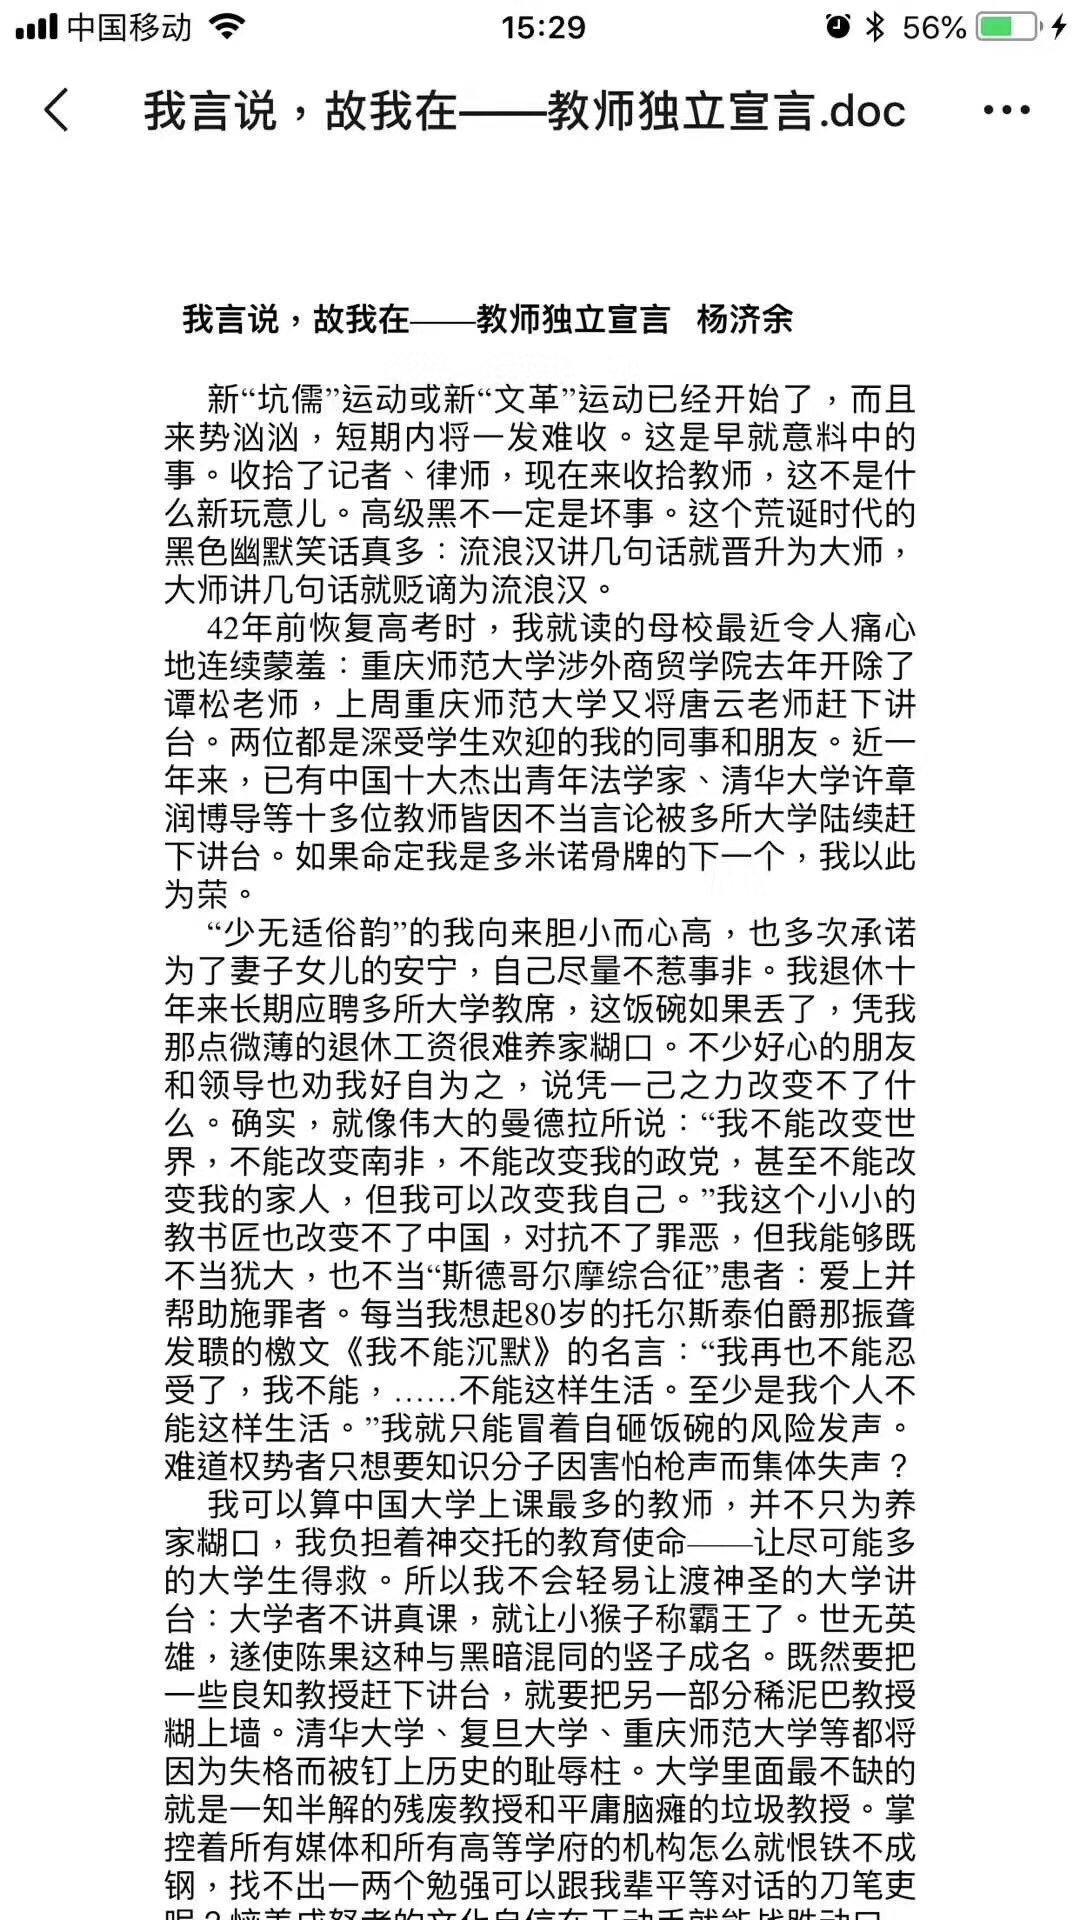 https://pbs.twimg.com/media/D2_xoB5UwAUkc68?format=jpg&name=orig